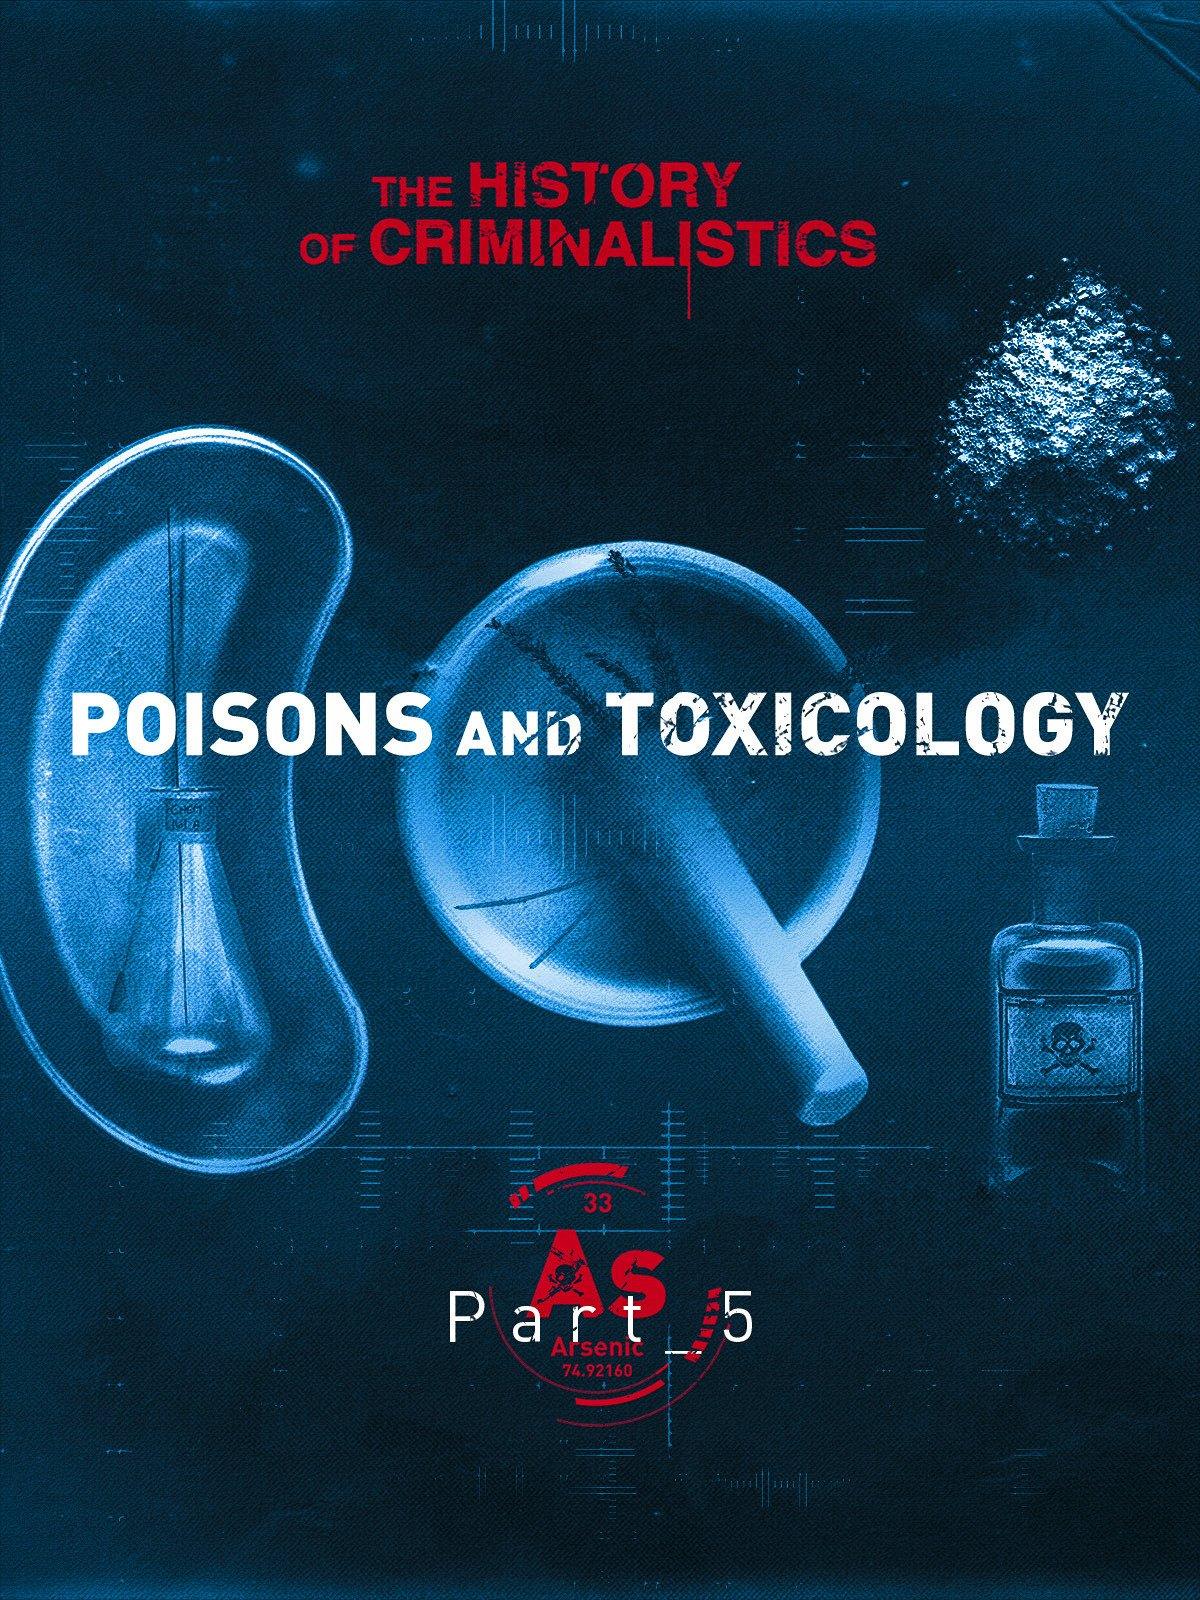 The History of Criminalistics. Poisons and Toxicology on Amazon Prime Video UK